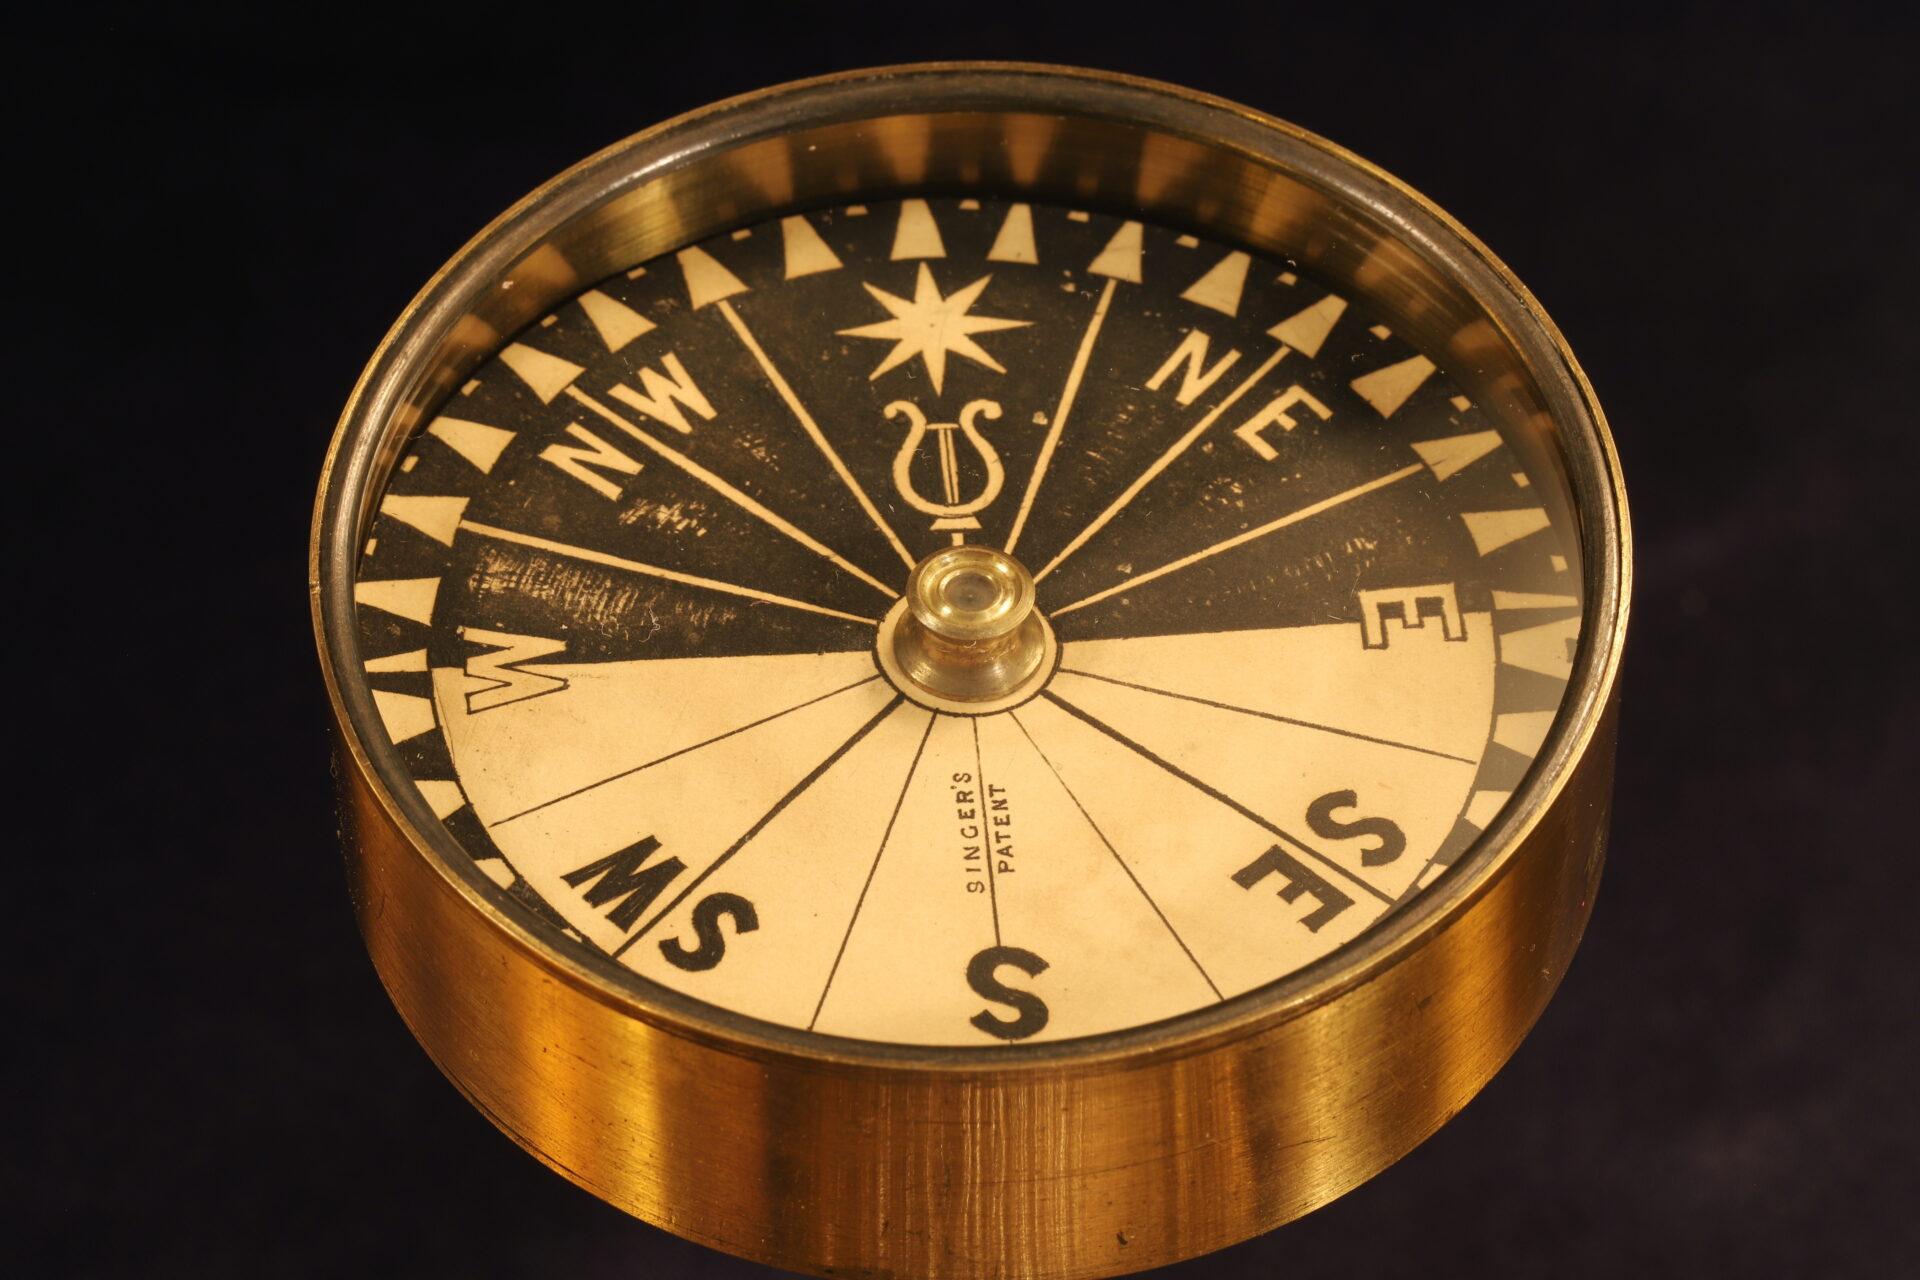 Image of Explorers Singers Patent Compass c1870